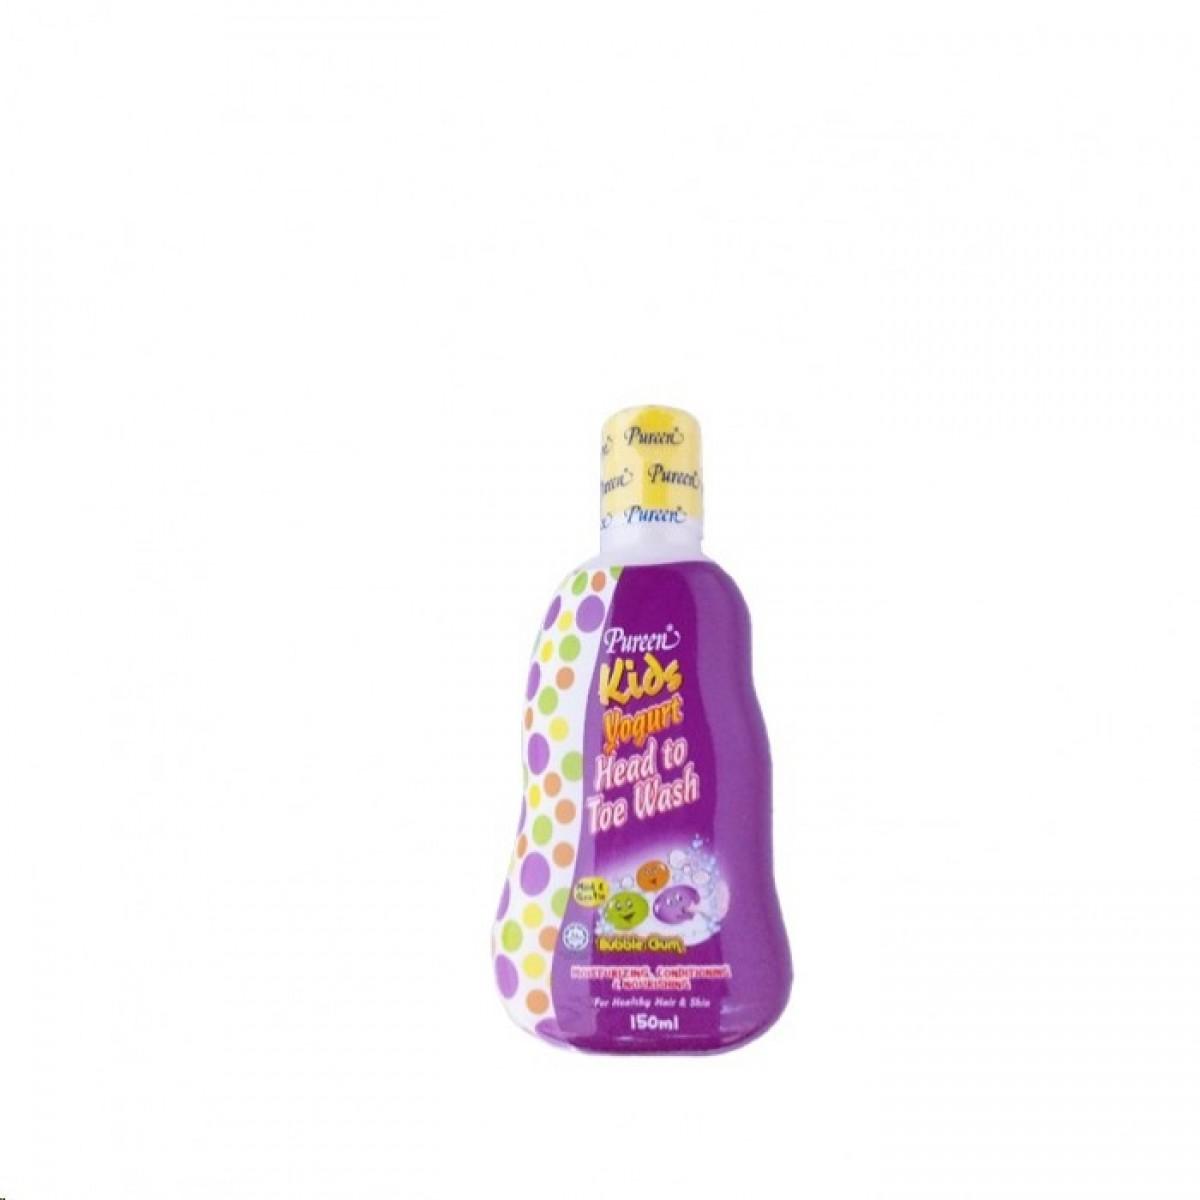 Pureen Kids Yogurt Head To Toe Wash Bubble Gum (150g) - Kico Baby Center